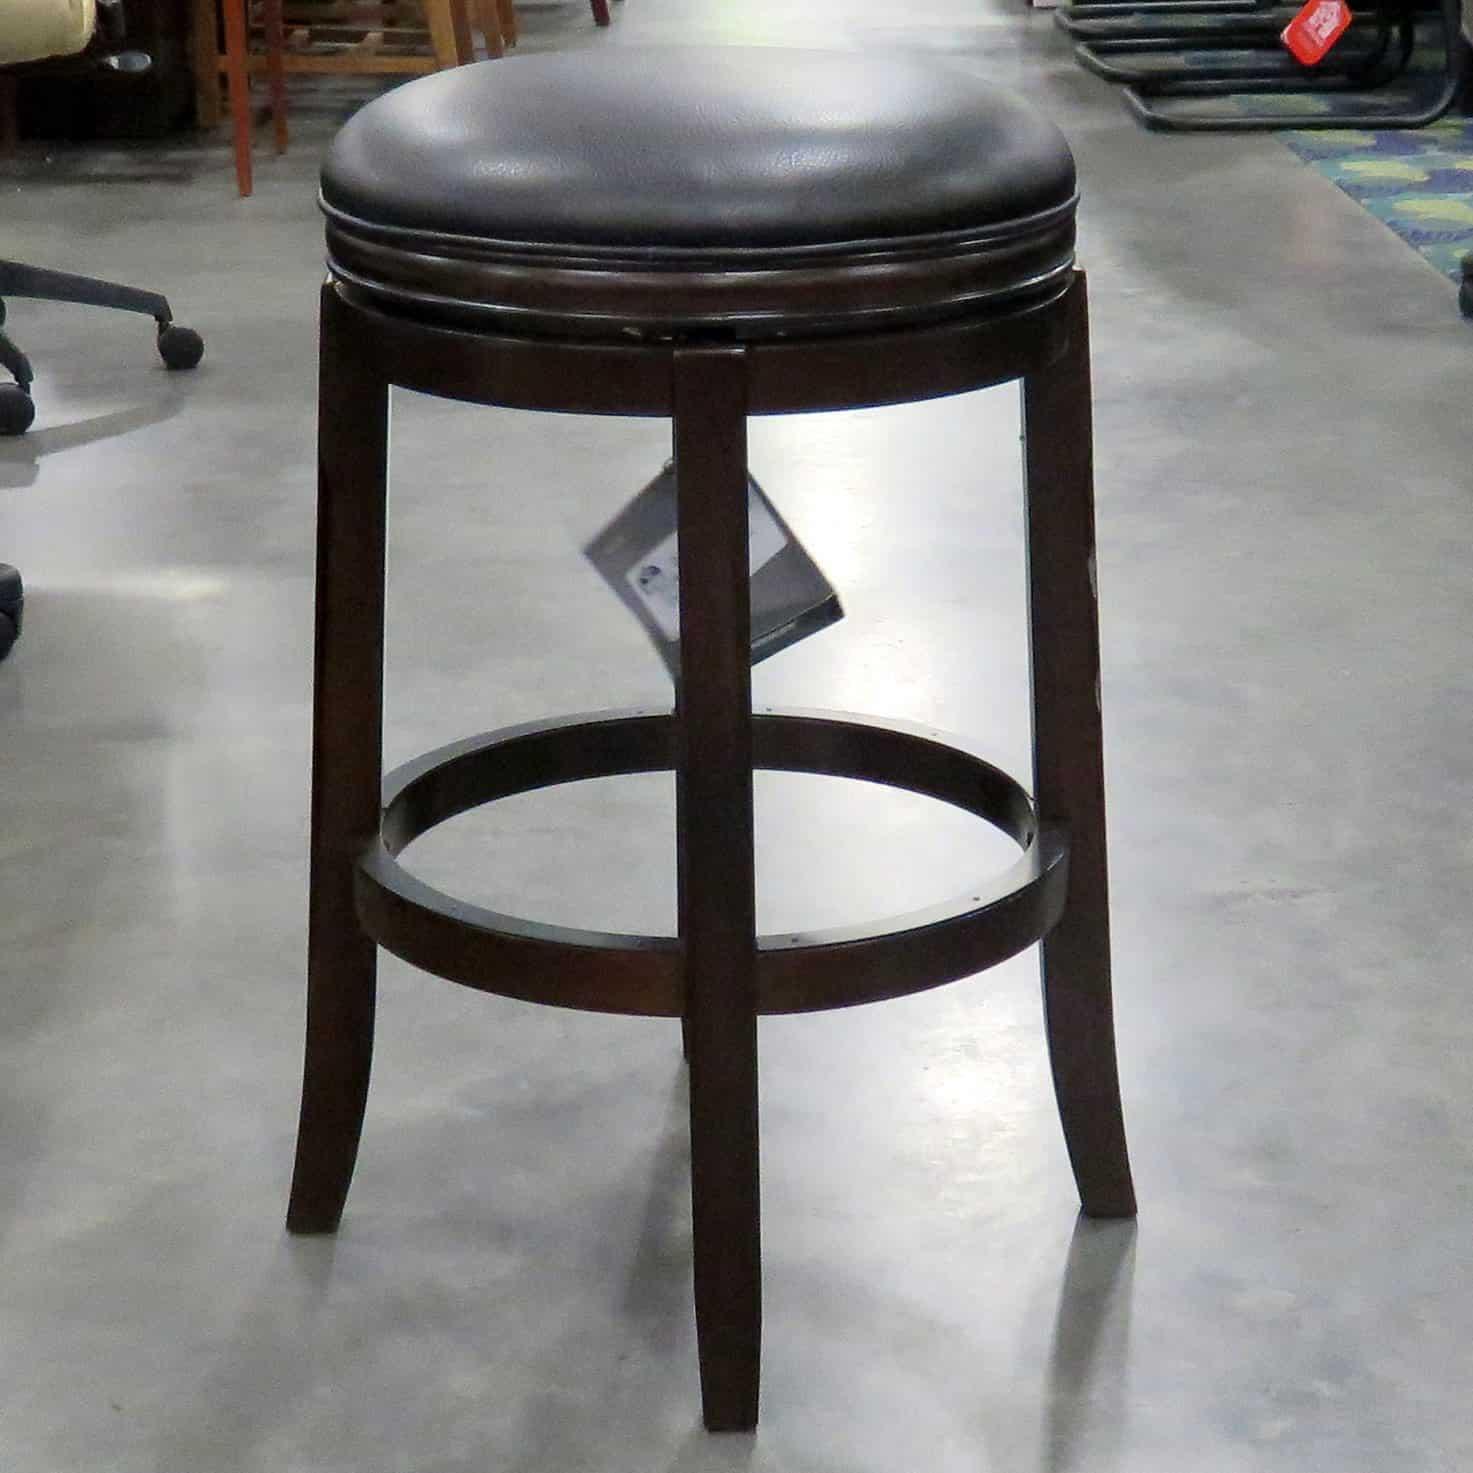 Ashley Furniture Porter Bar Height Swivel Stool